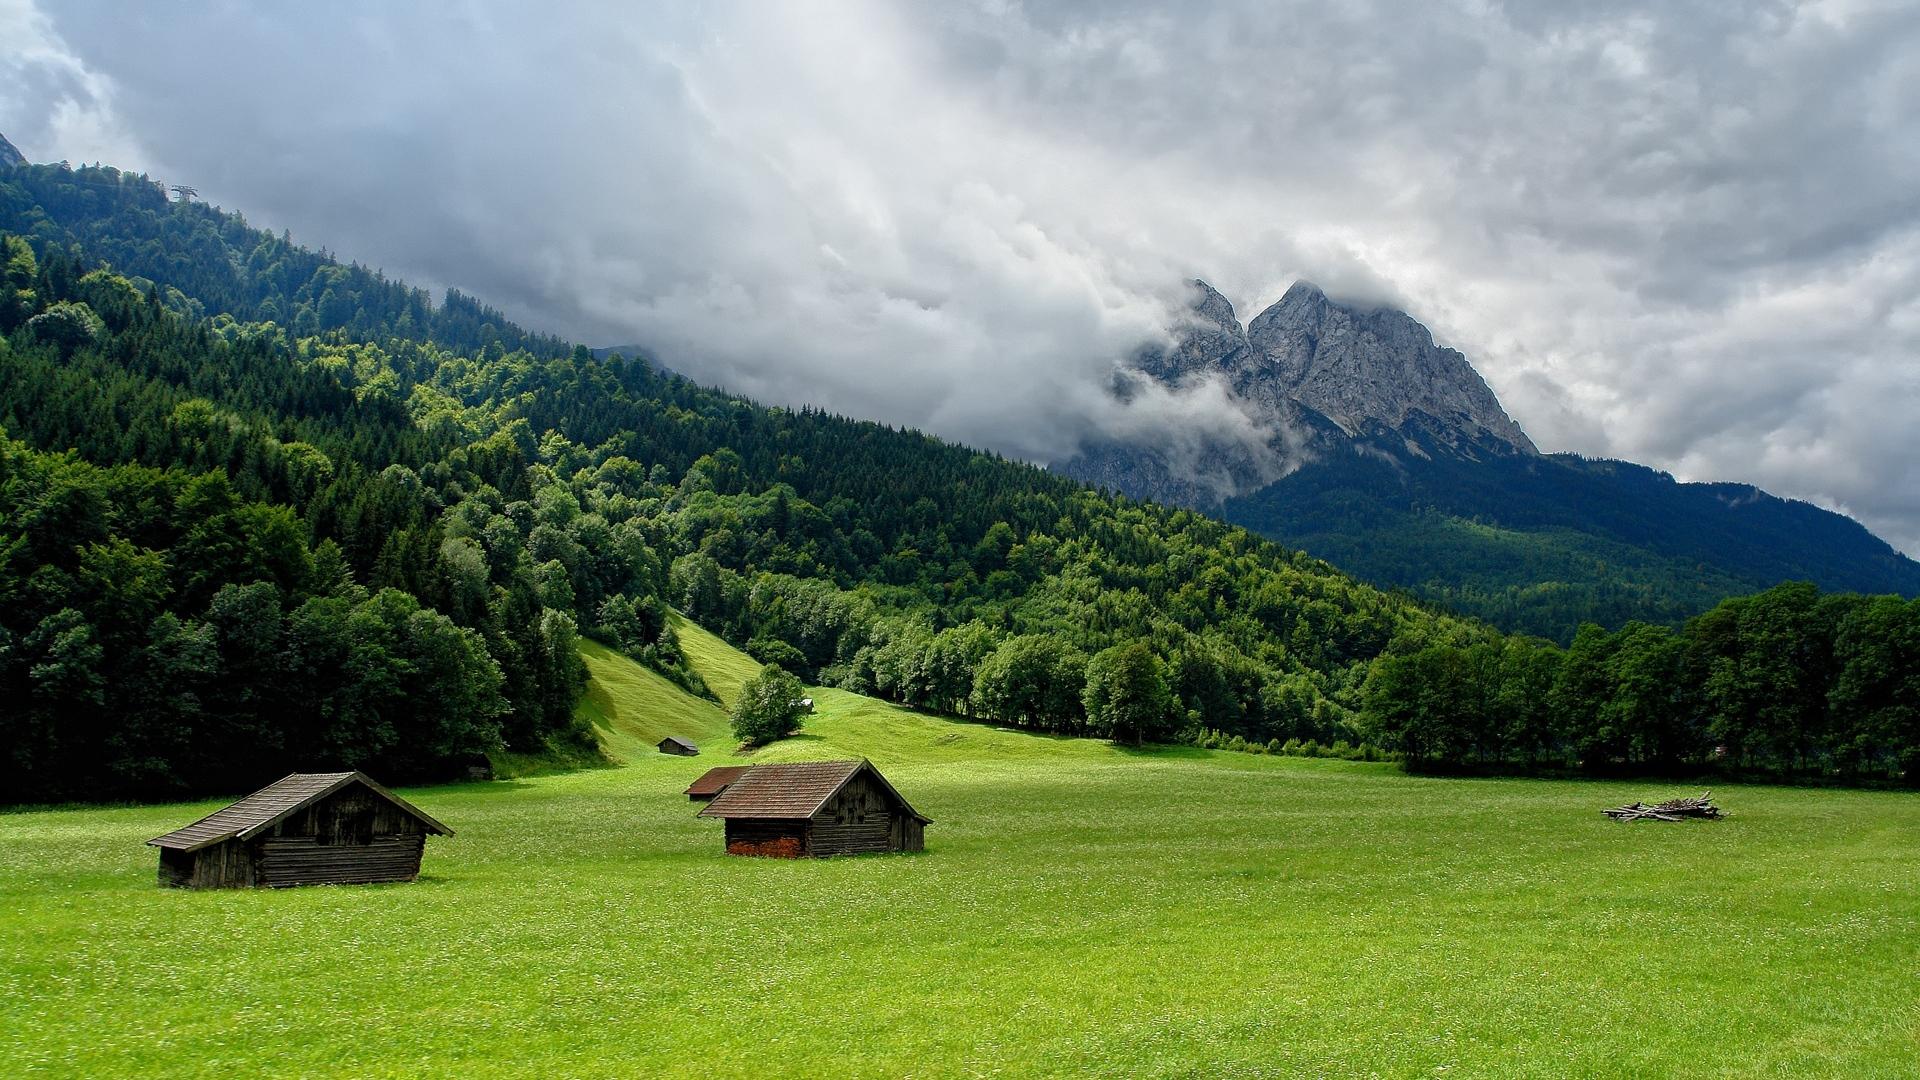 Download Wallpaper 1920x1080 Mountains Plain Lodges